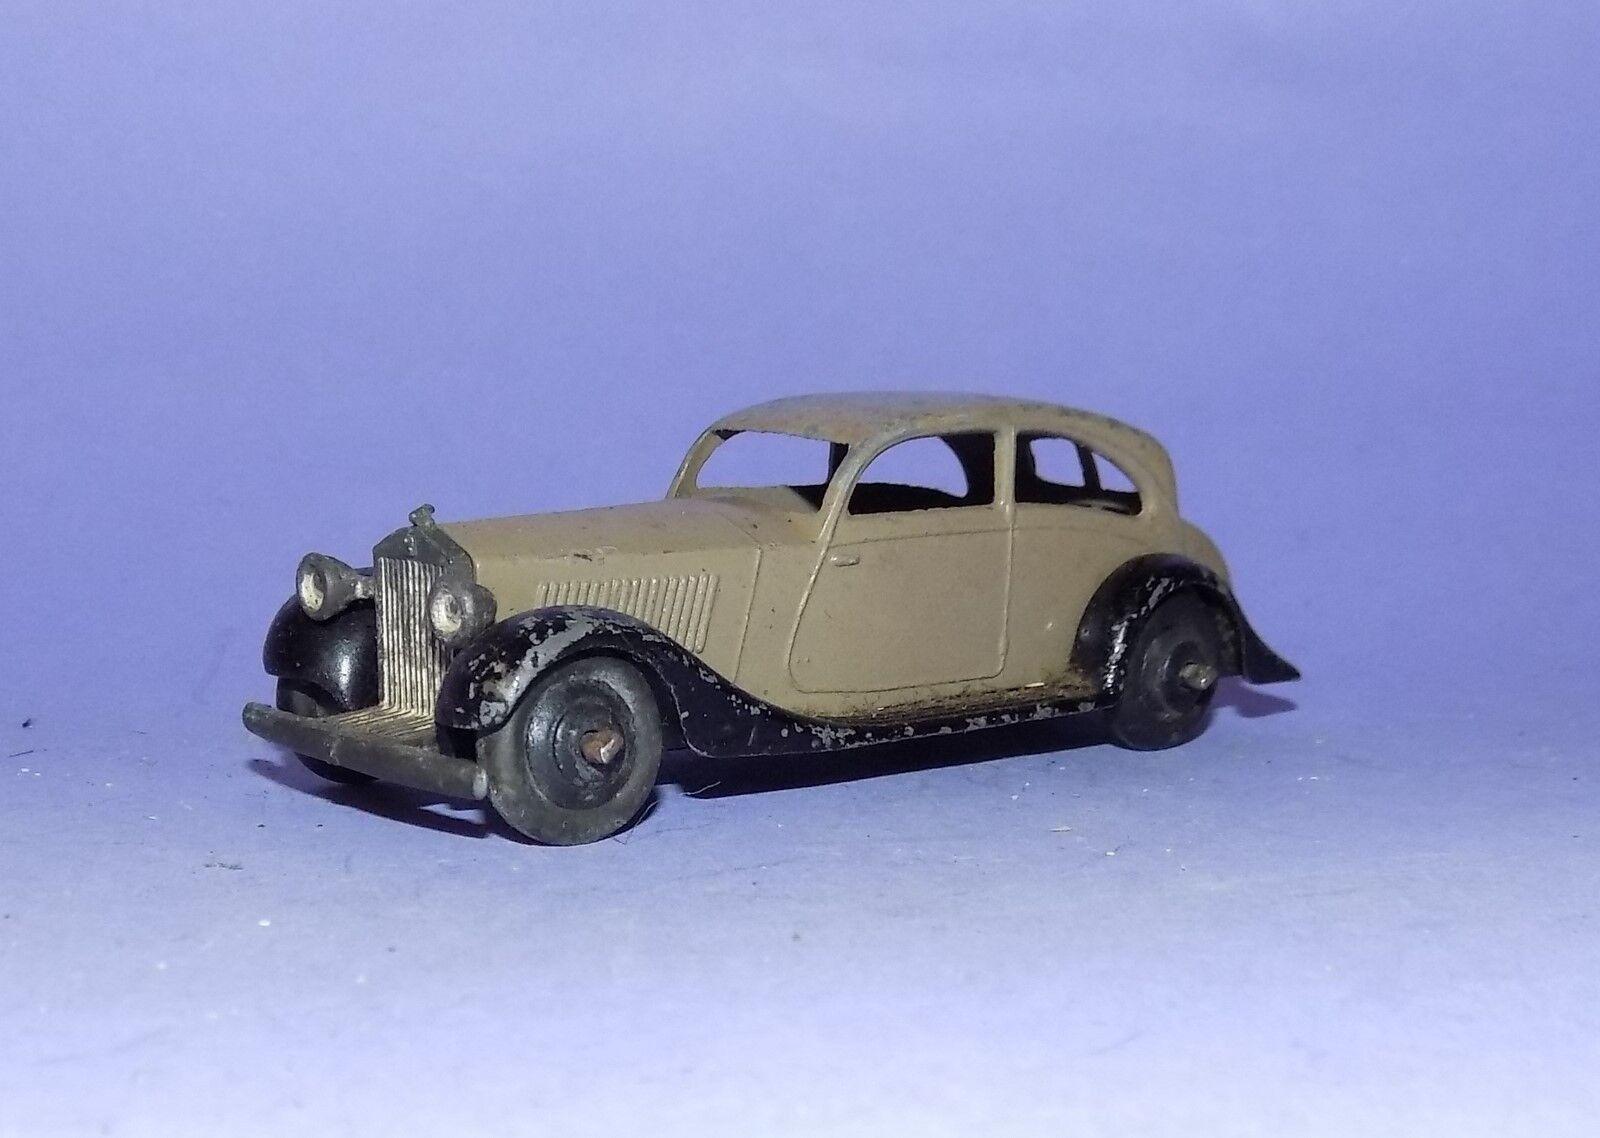 VINTAGE  1935 - 1950  DINKY TOYS  NO 30B  ROLLS ROYCE  LOT 1